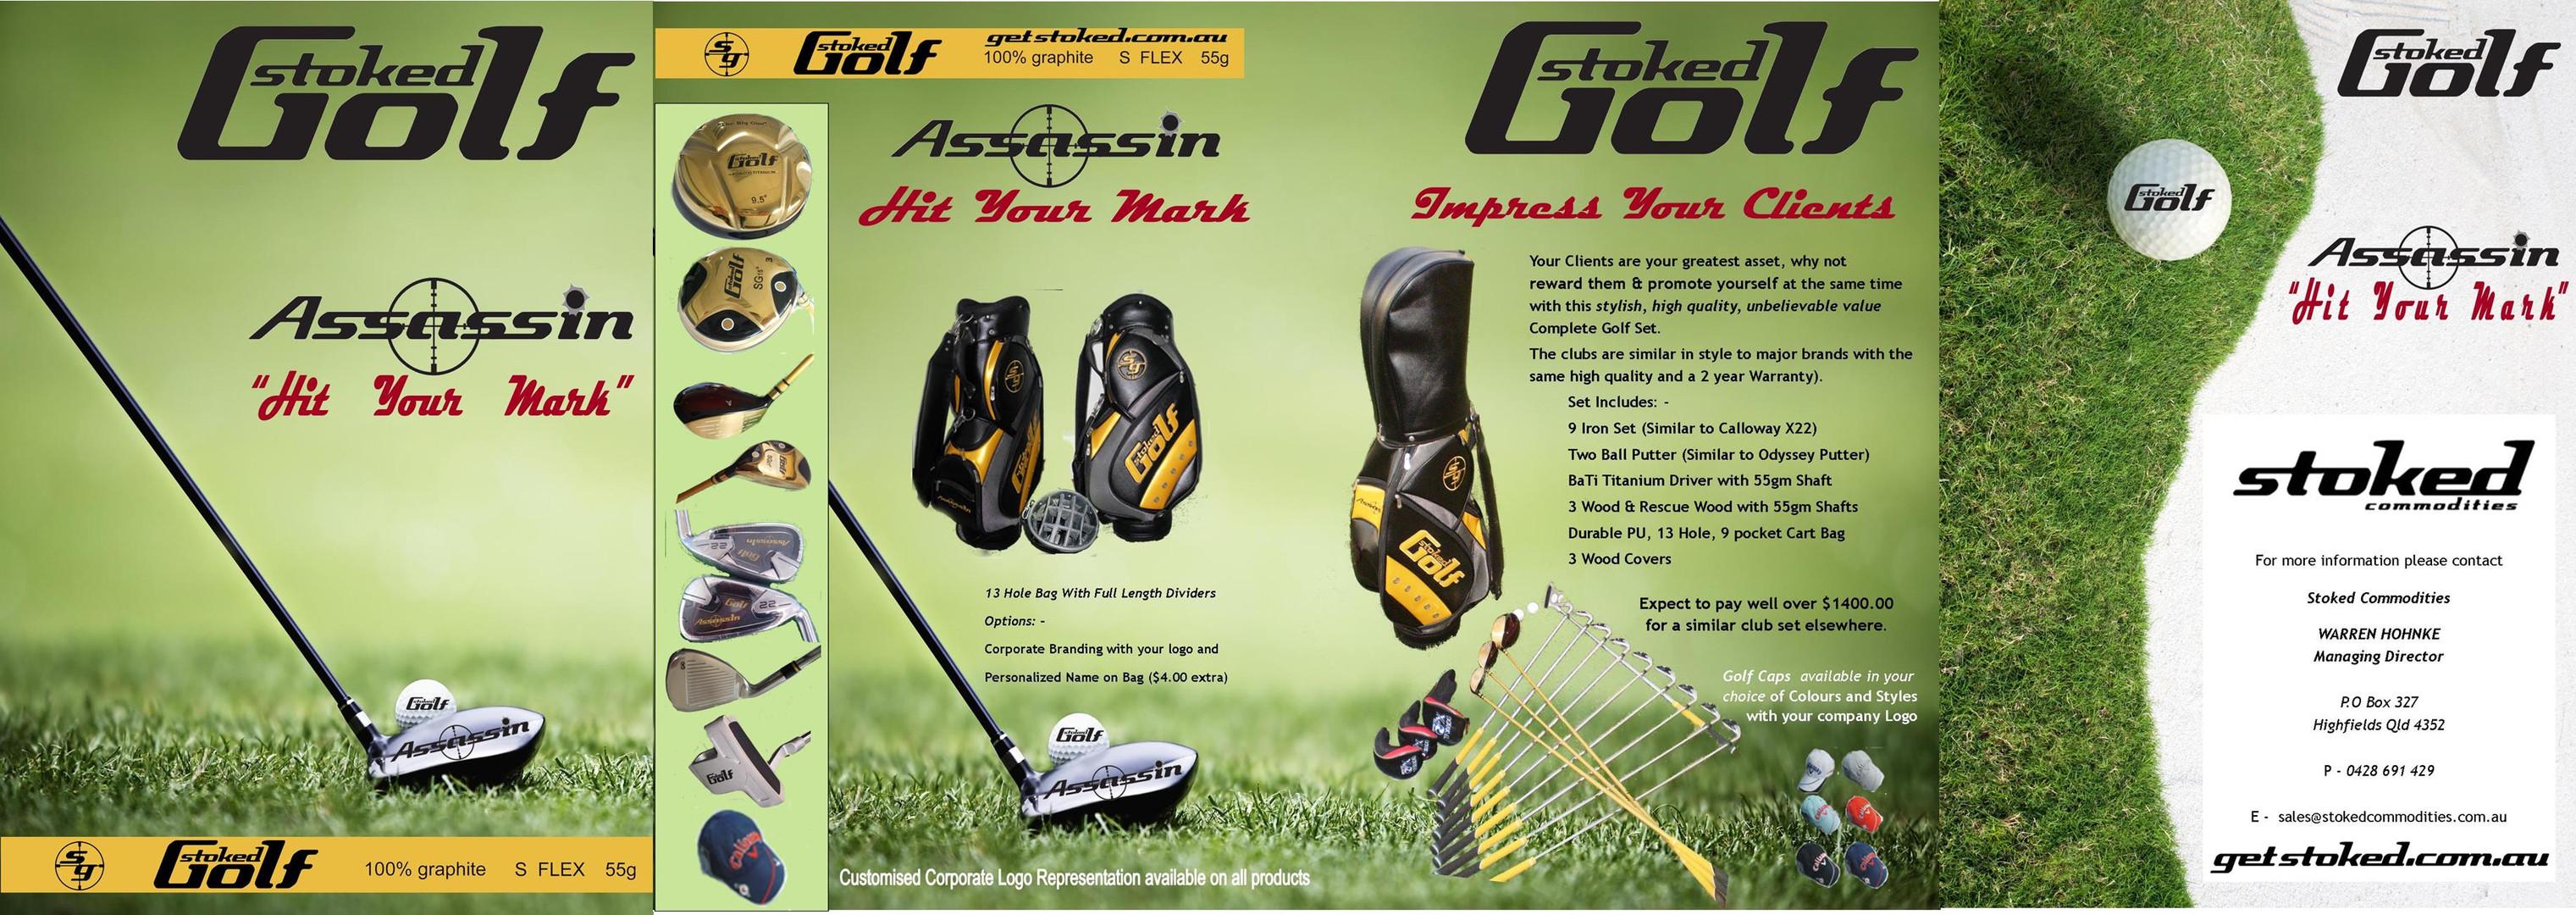 stoked+golf+.jpg